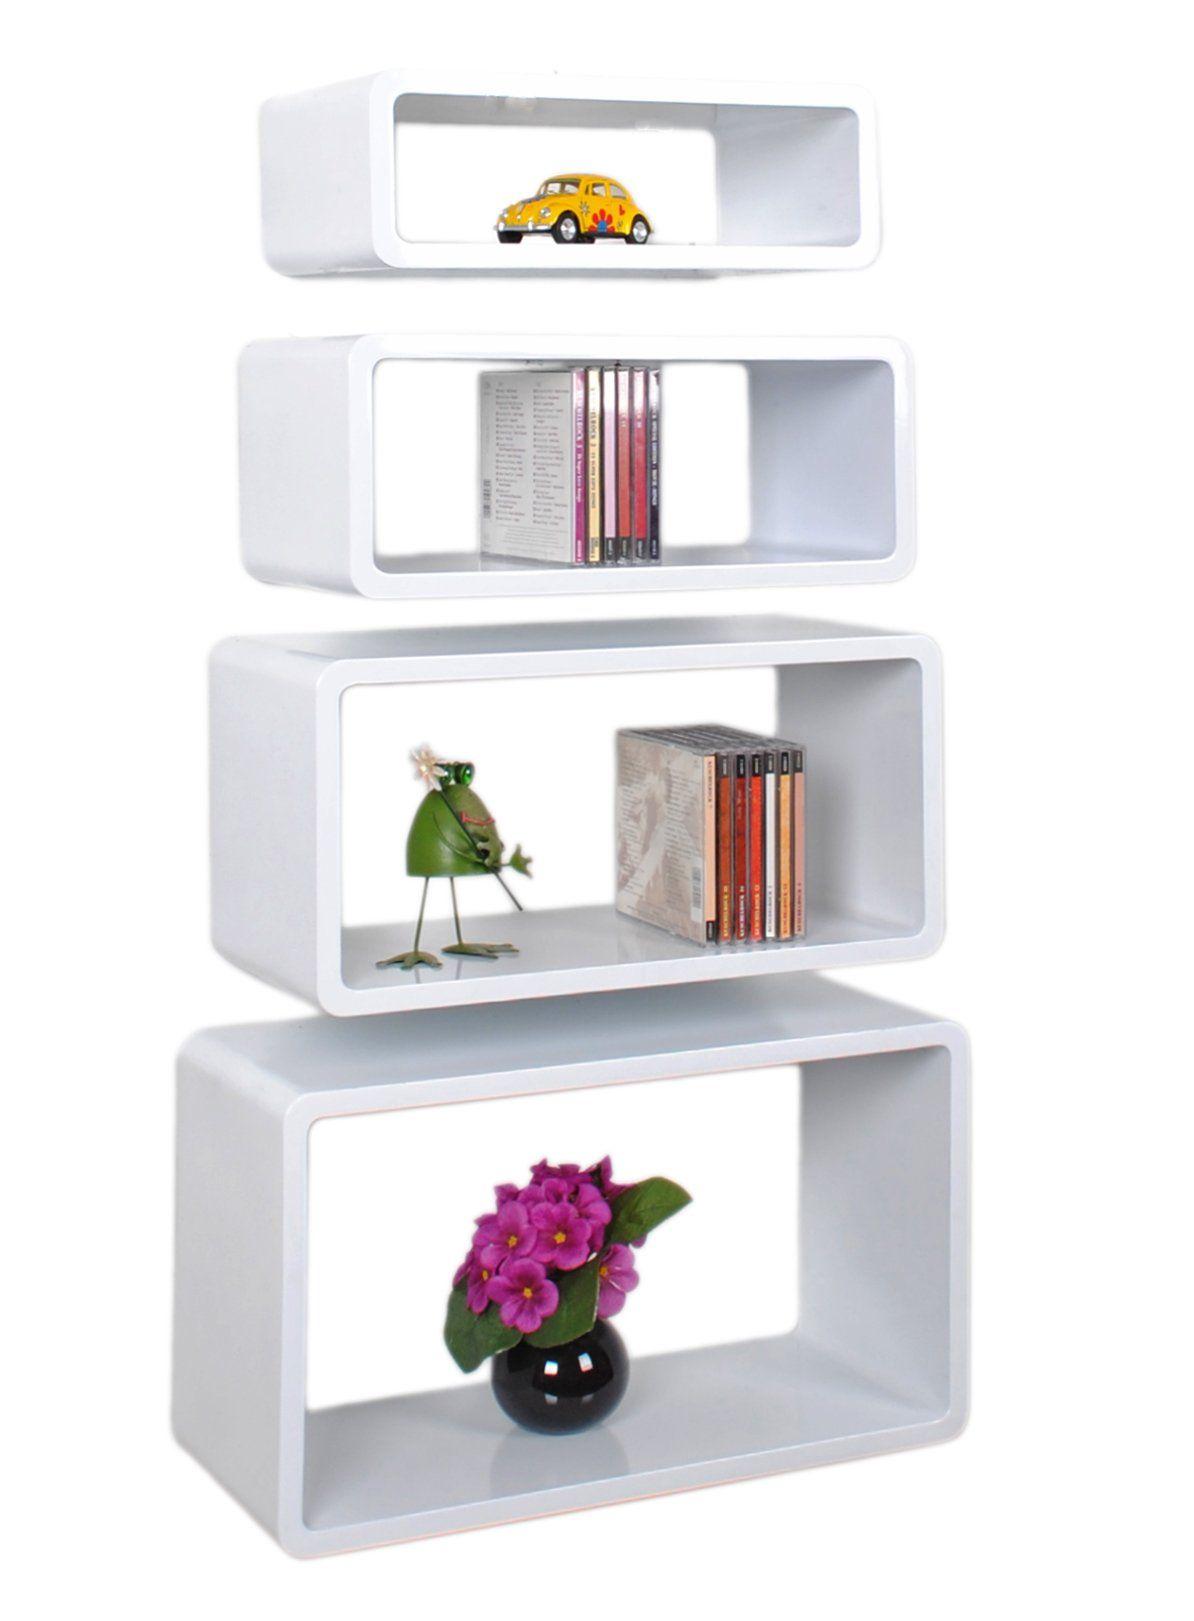 Ikea regal kuche weiss - Ikea kuche wandregal ...